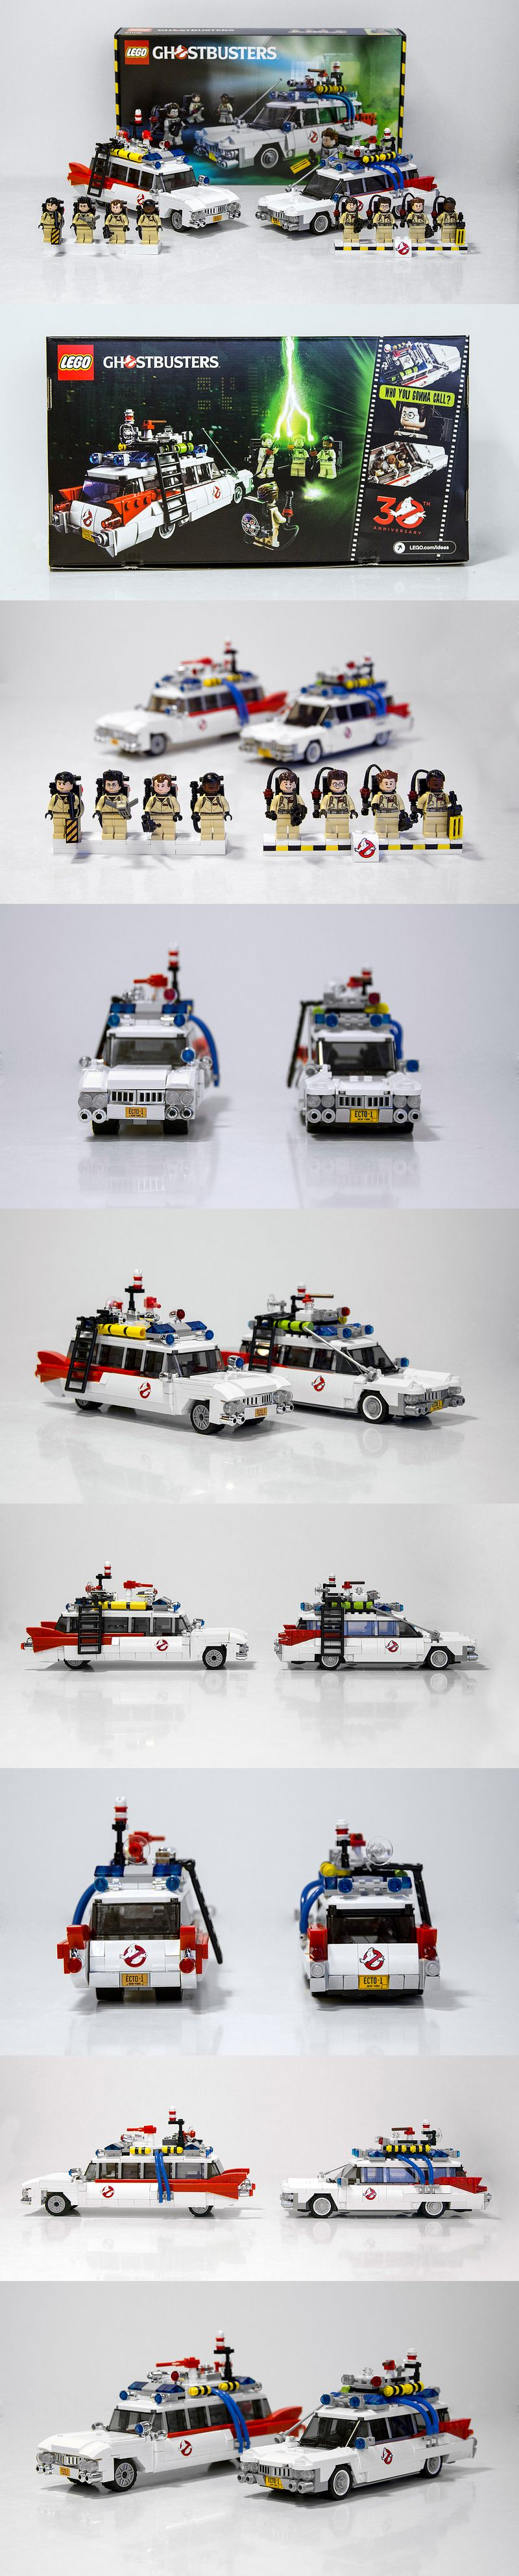 Box Art And Full Comparison Lego Pinterest Lego Lego